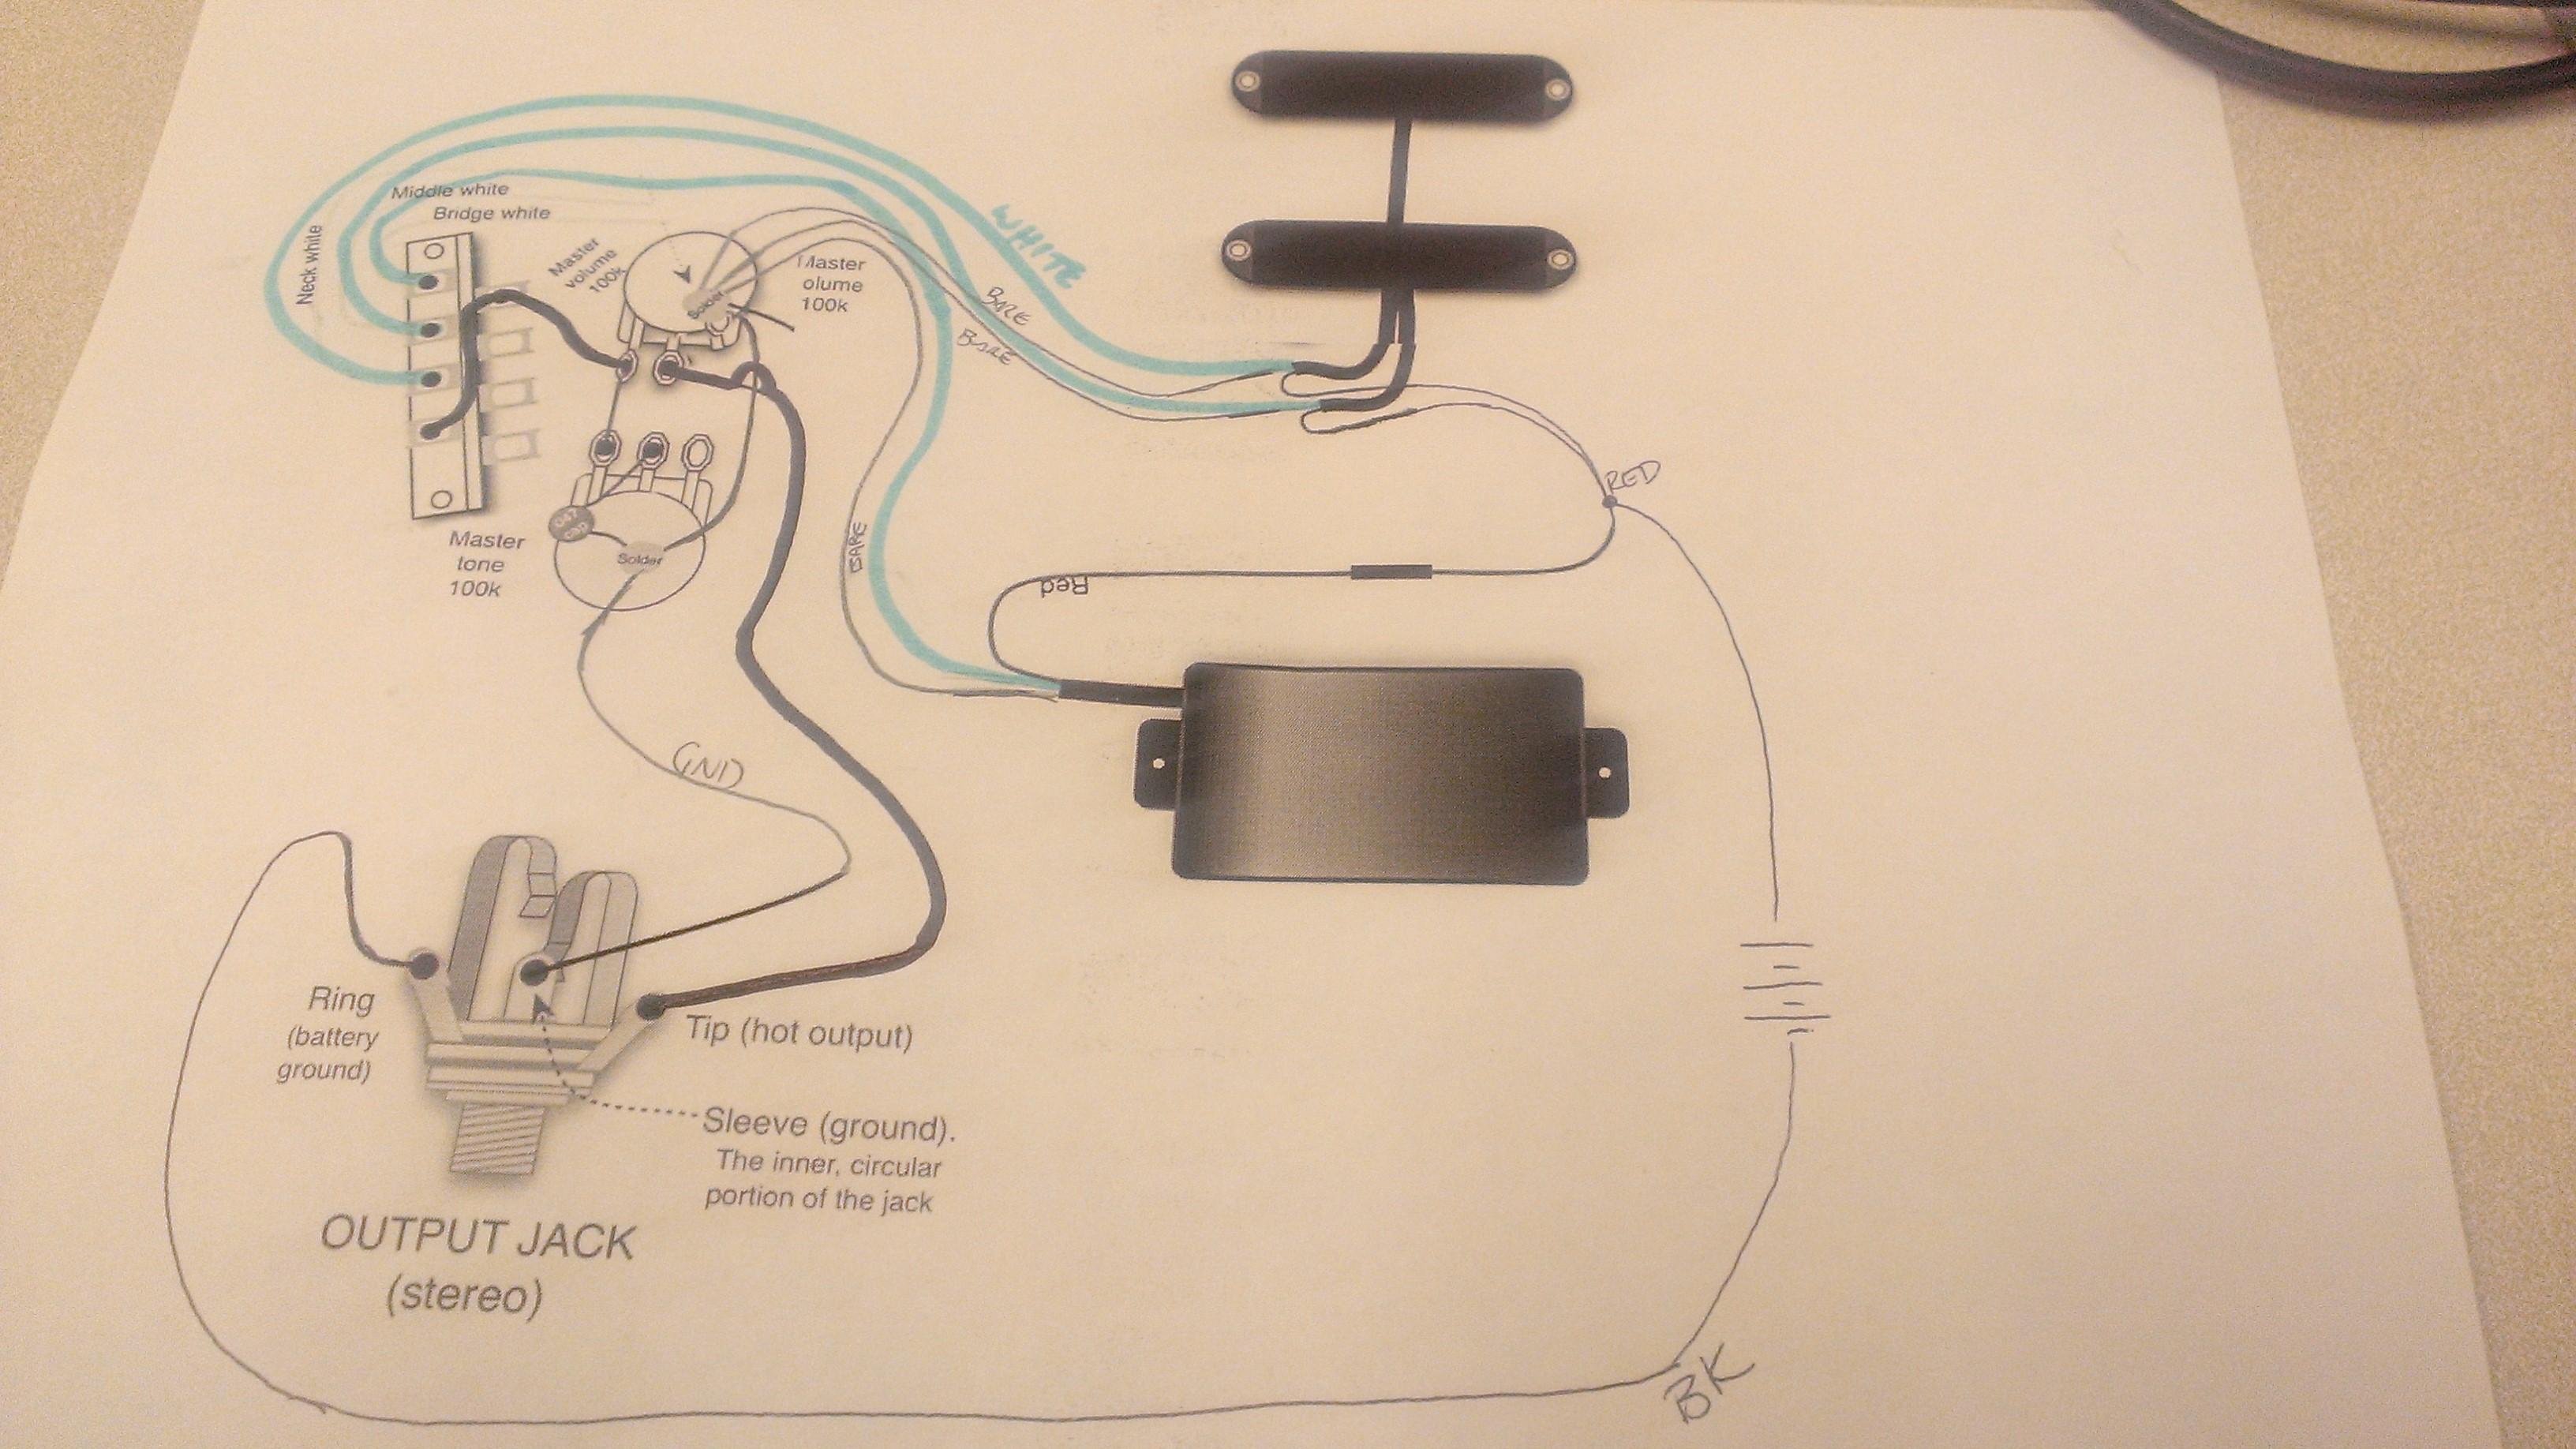 Jackson Wiring Diagram For V - on jackson performer wiring, jackson guitar wiring schematics, jackson electric guitar schematic, guitar string diagram, jackson 3-way switches, jackson flying v wiring, jackson king v schematic, jca20h diagram,